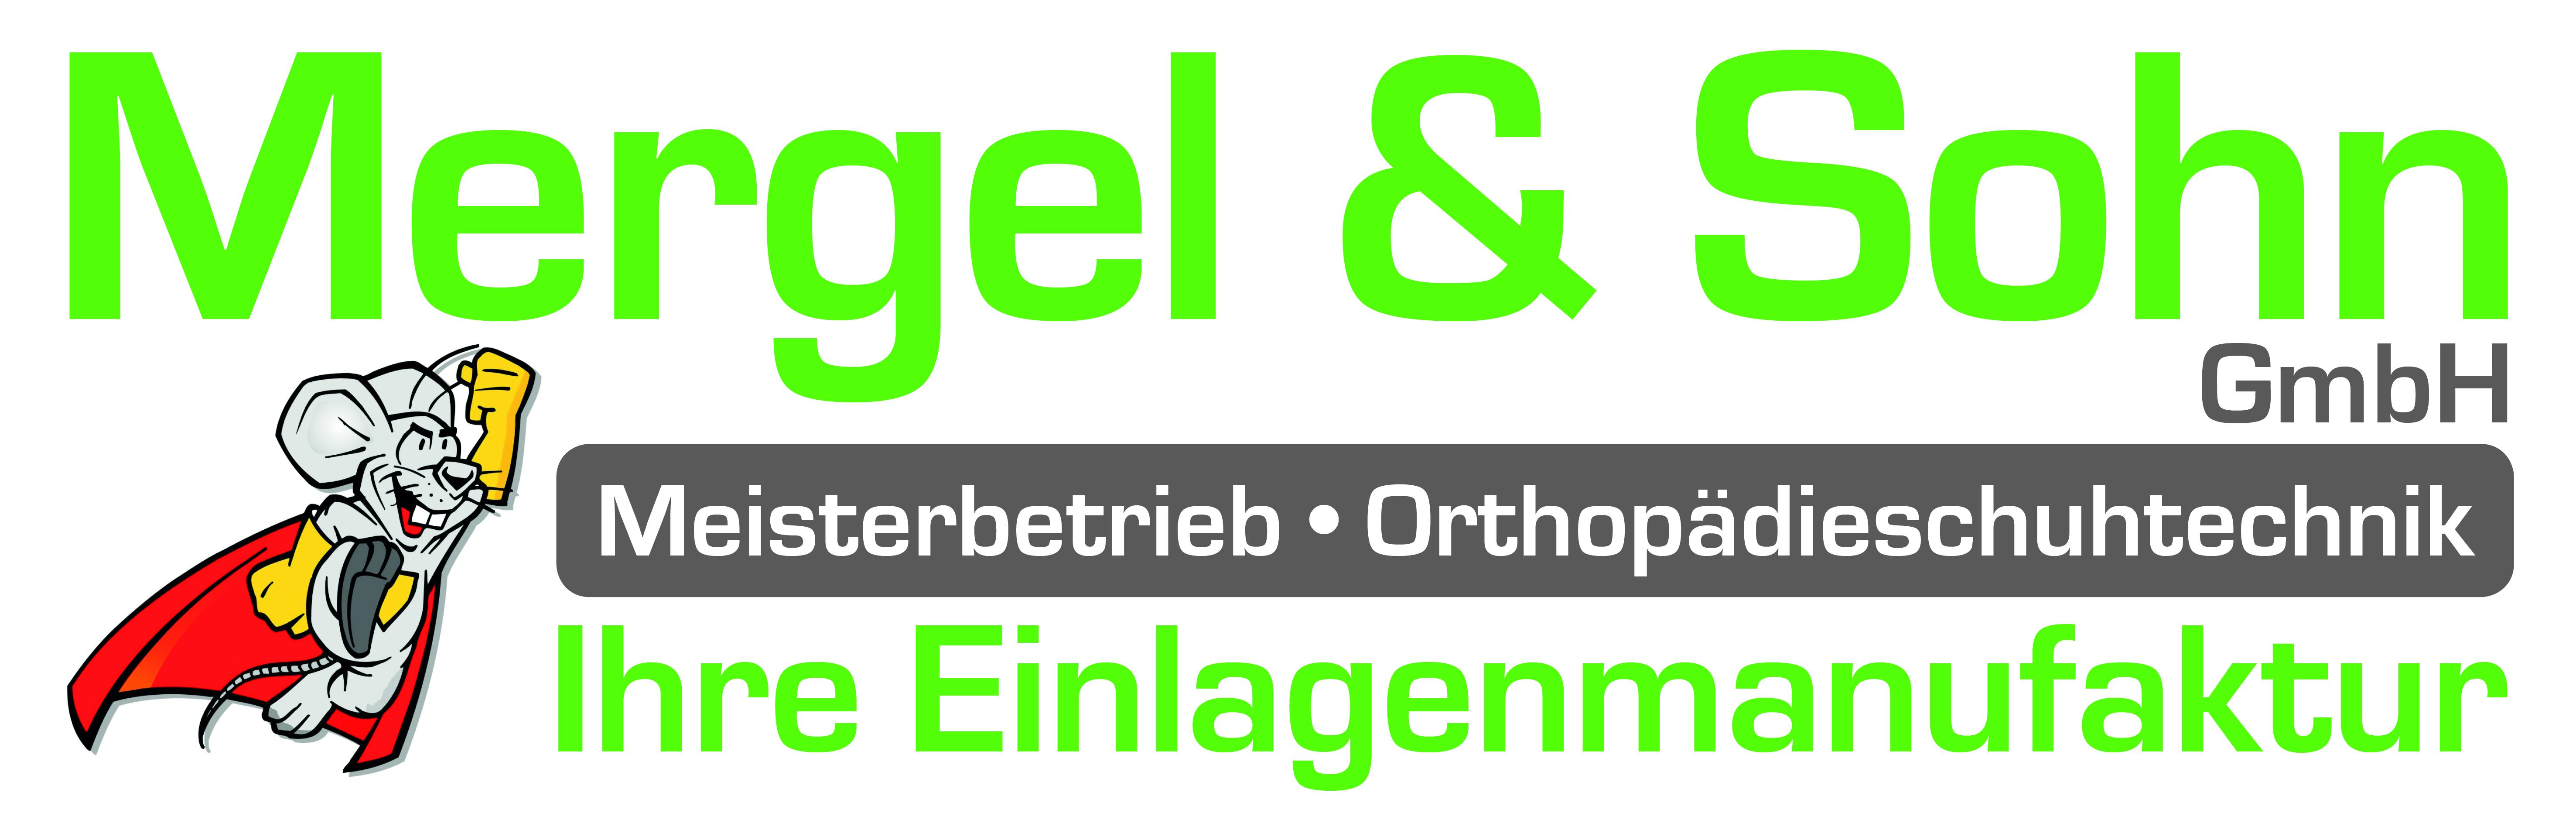 Mergel & Sohn GmbH